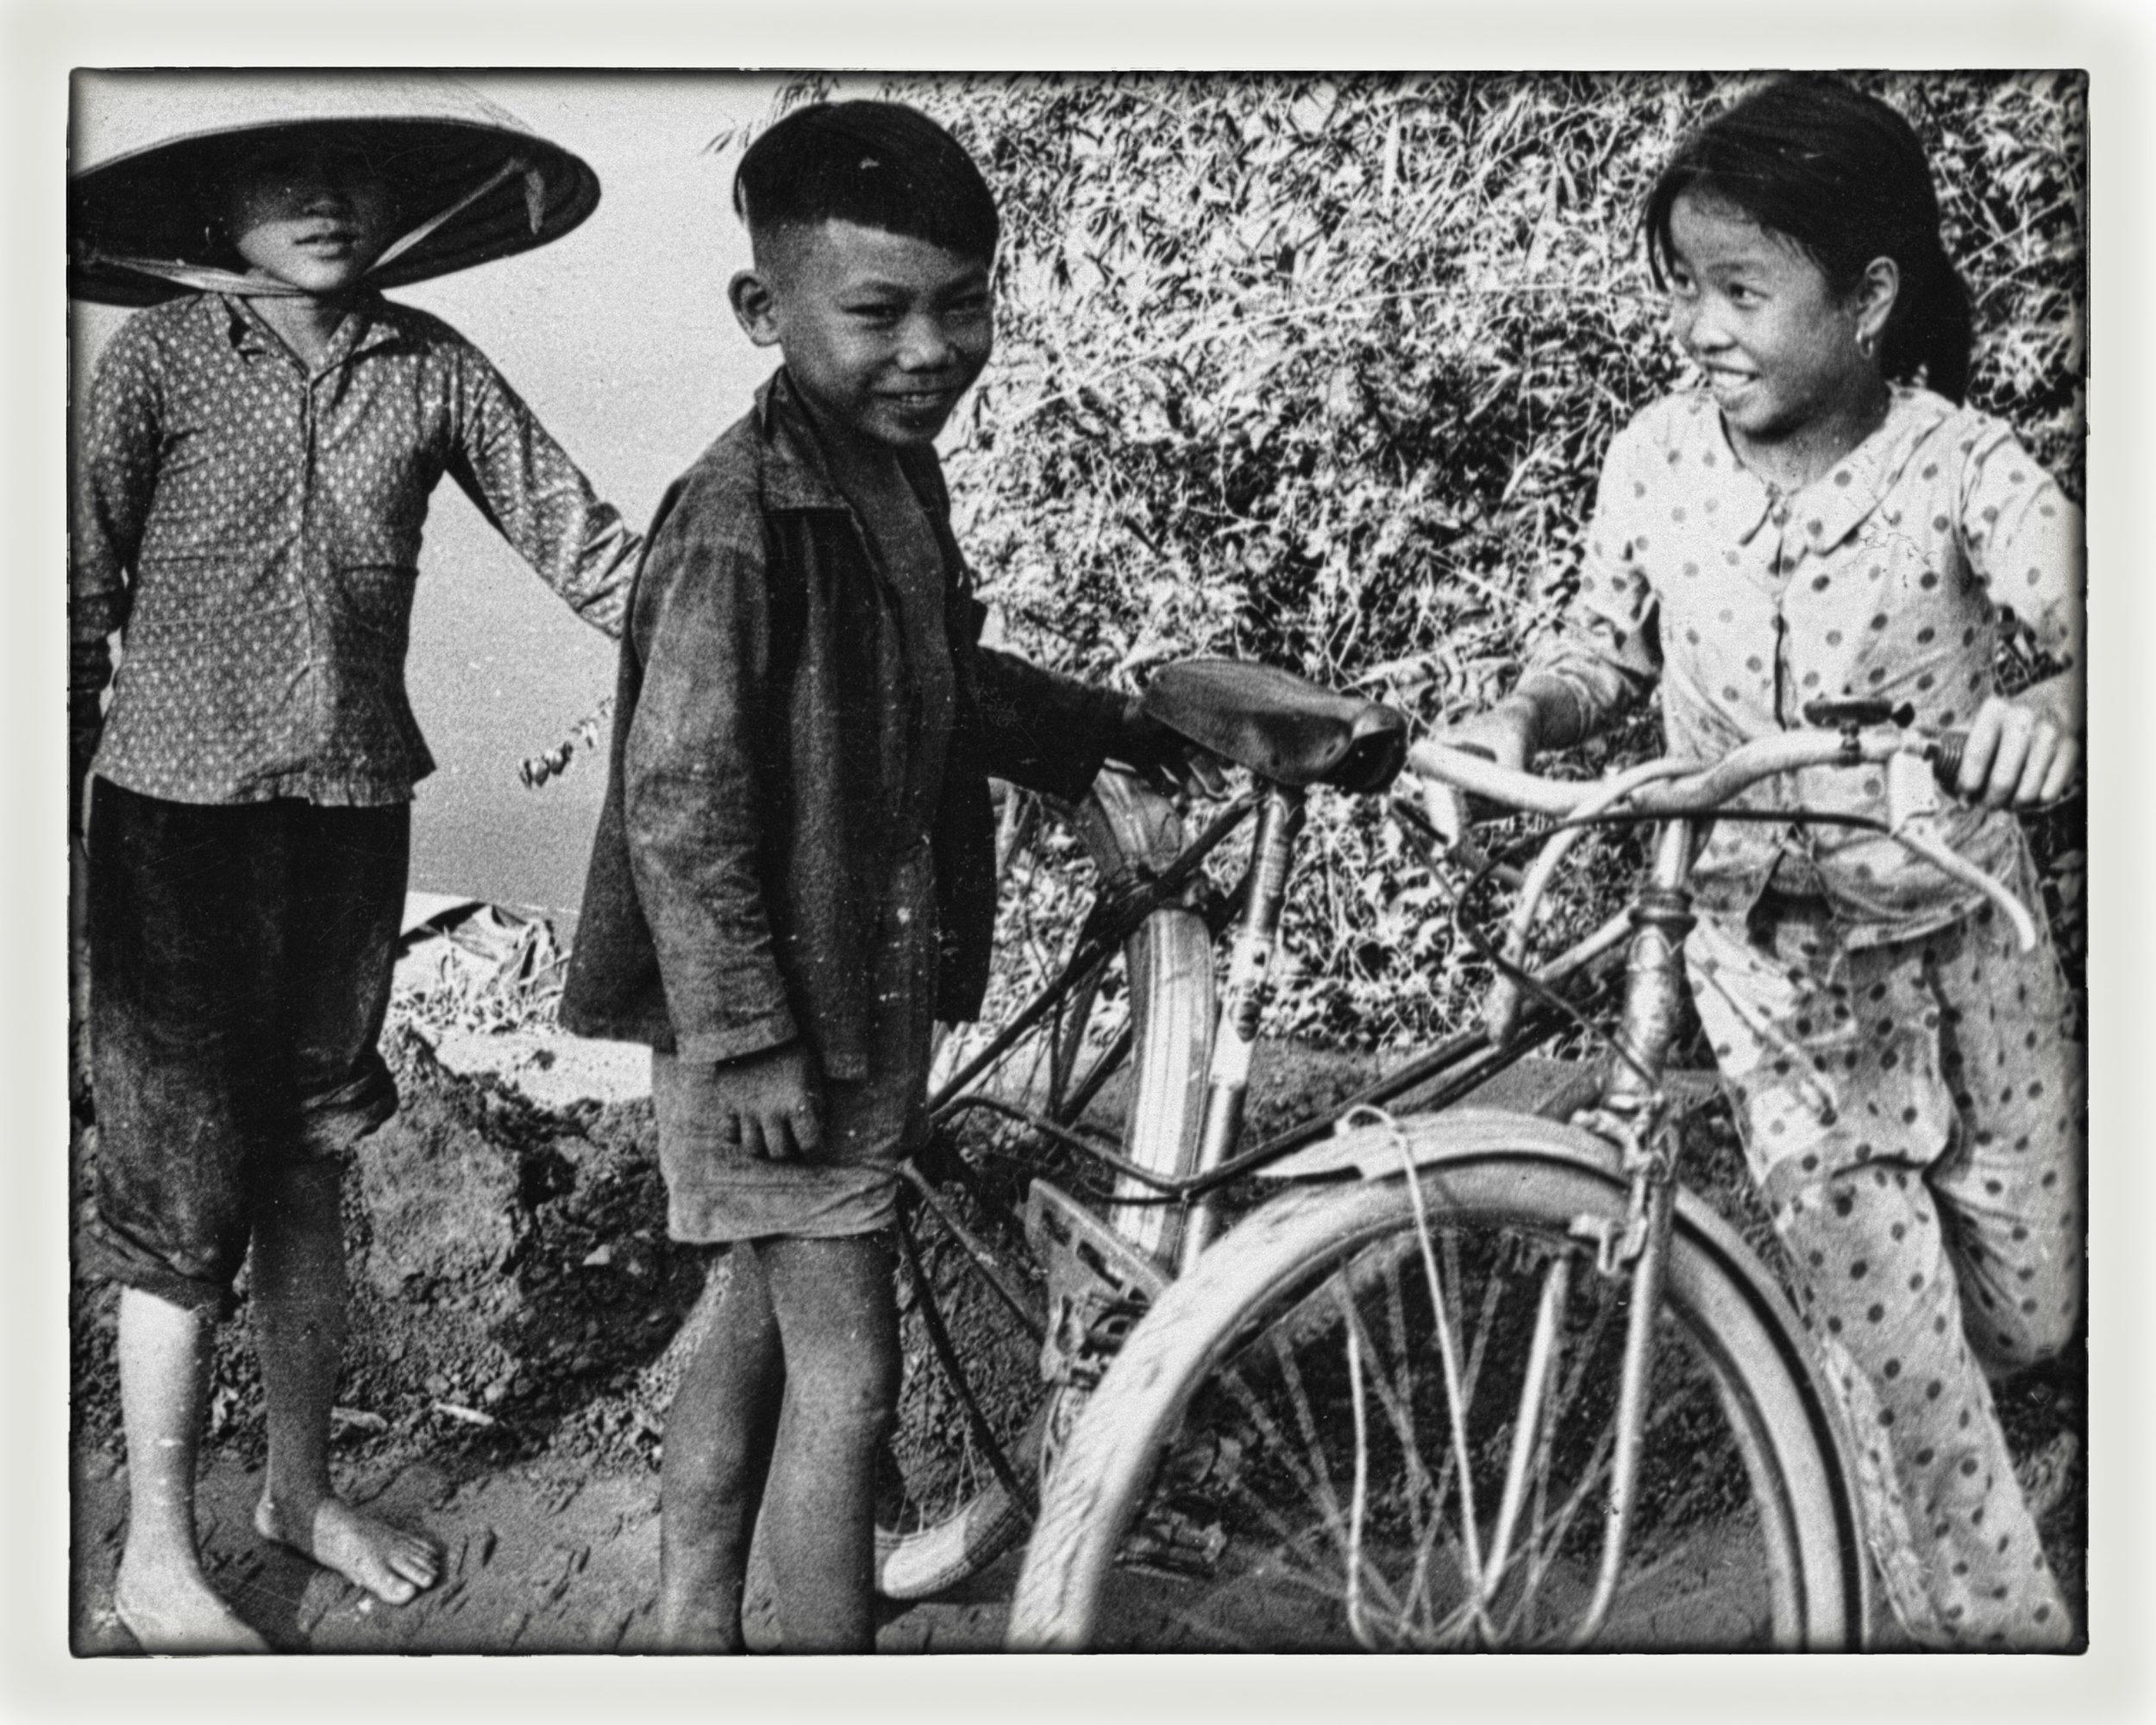 kids with bike-Edit.jpg